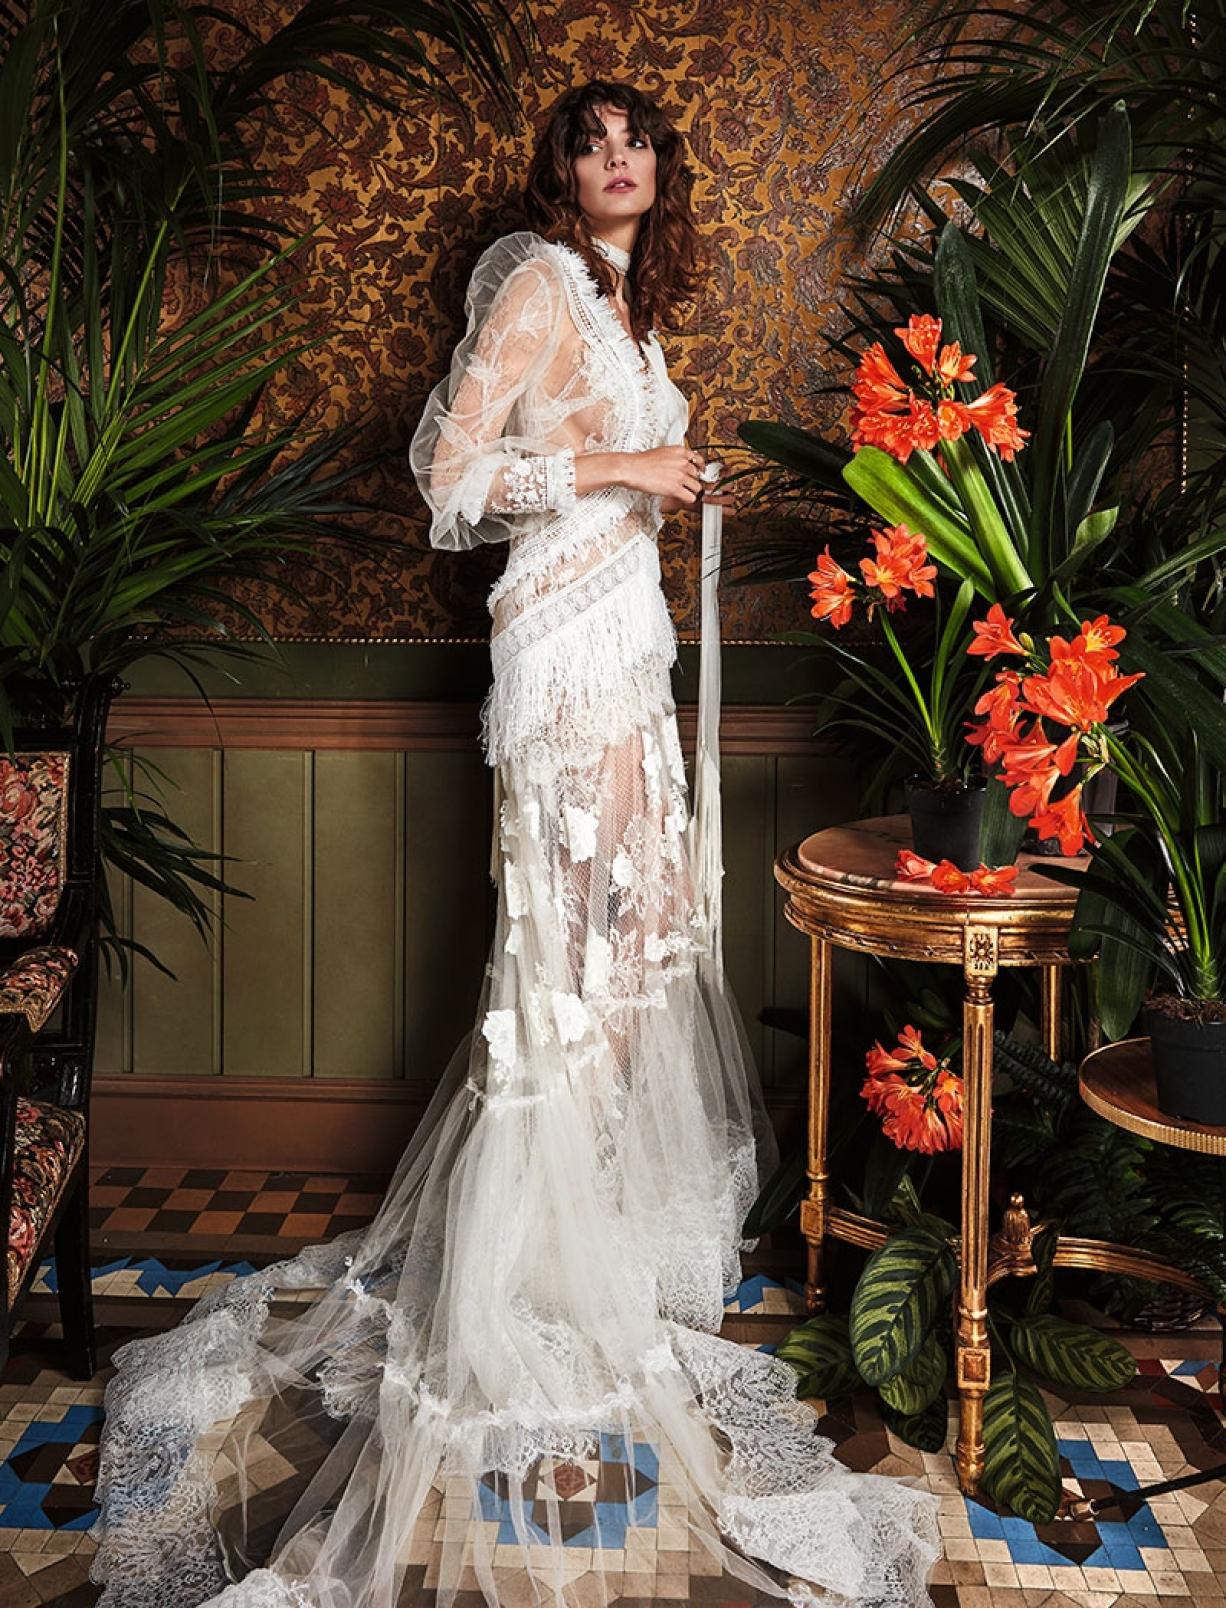 boho_chic_wedding_dresses_2017_bohemian_lace_wedding_dress_yolan_cris_chris_style_calamo-3.jpg